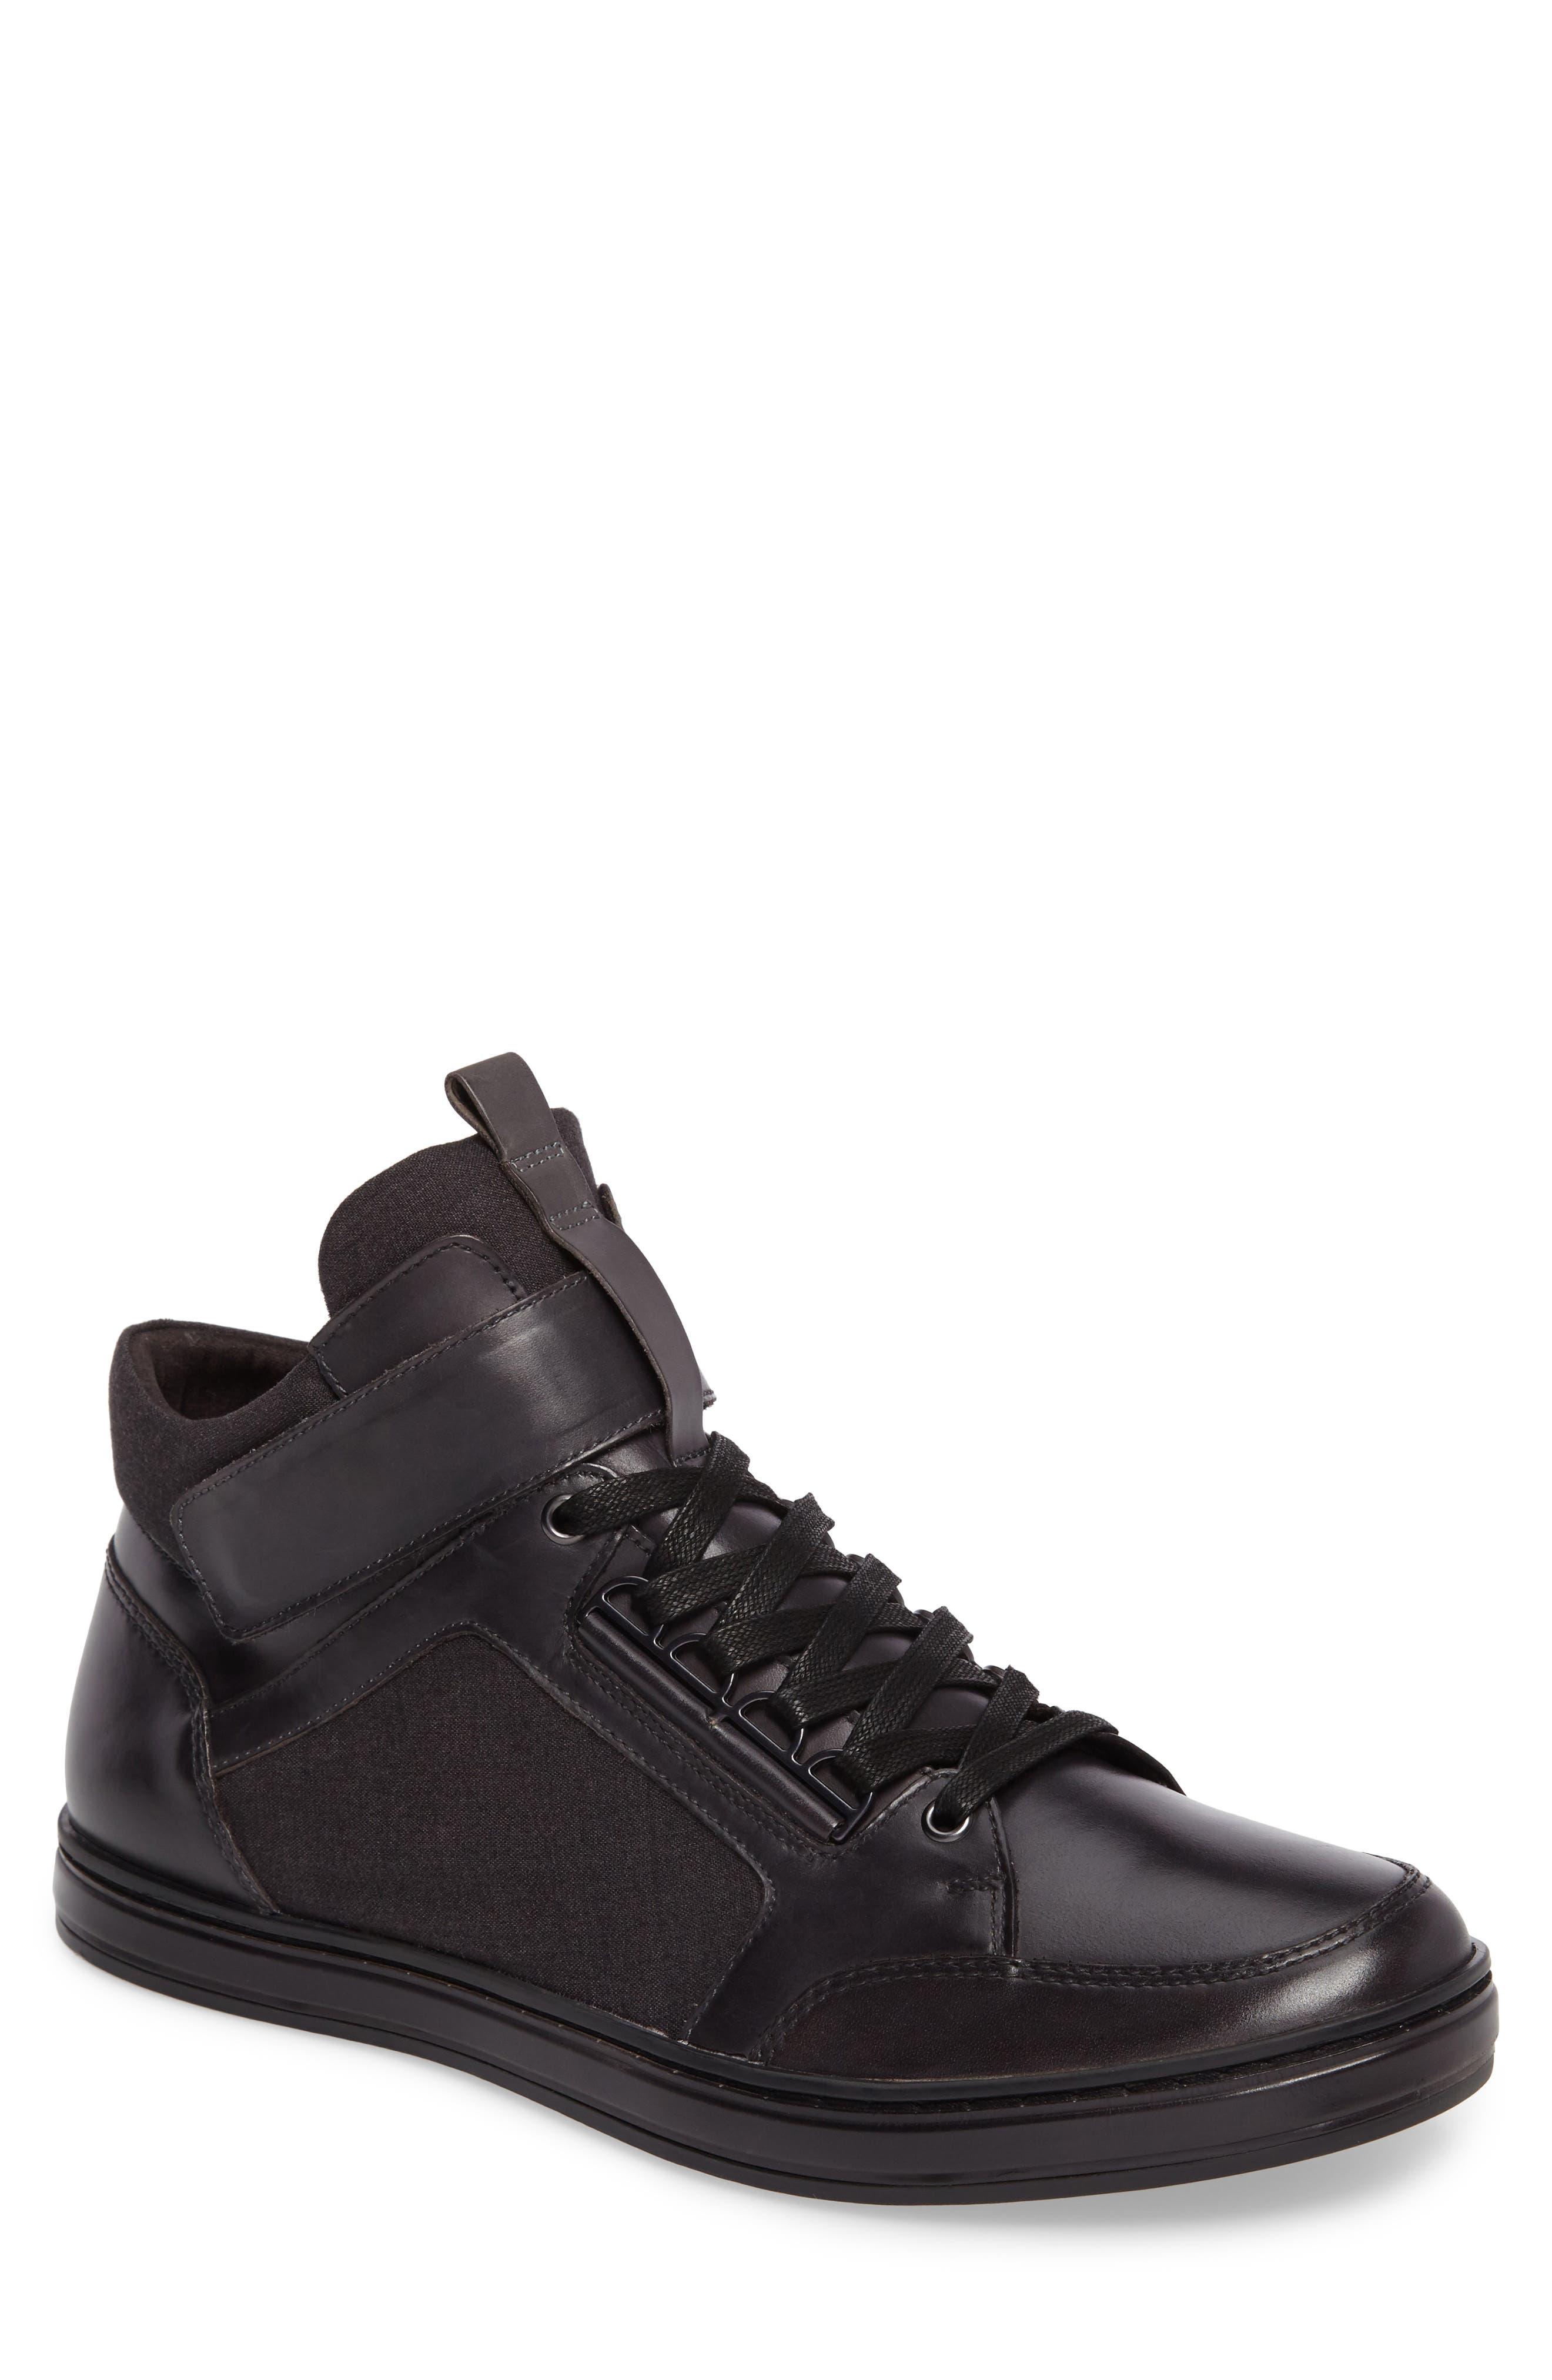 Kenneth Cole New York Brand-Y Sneaker (Men)